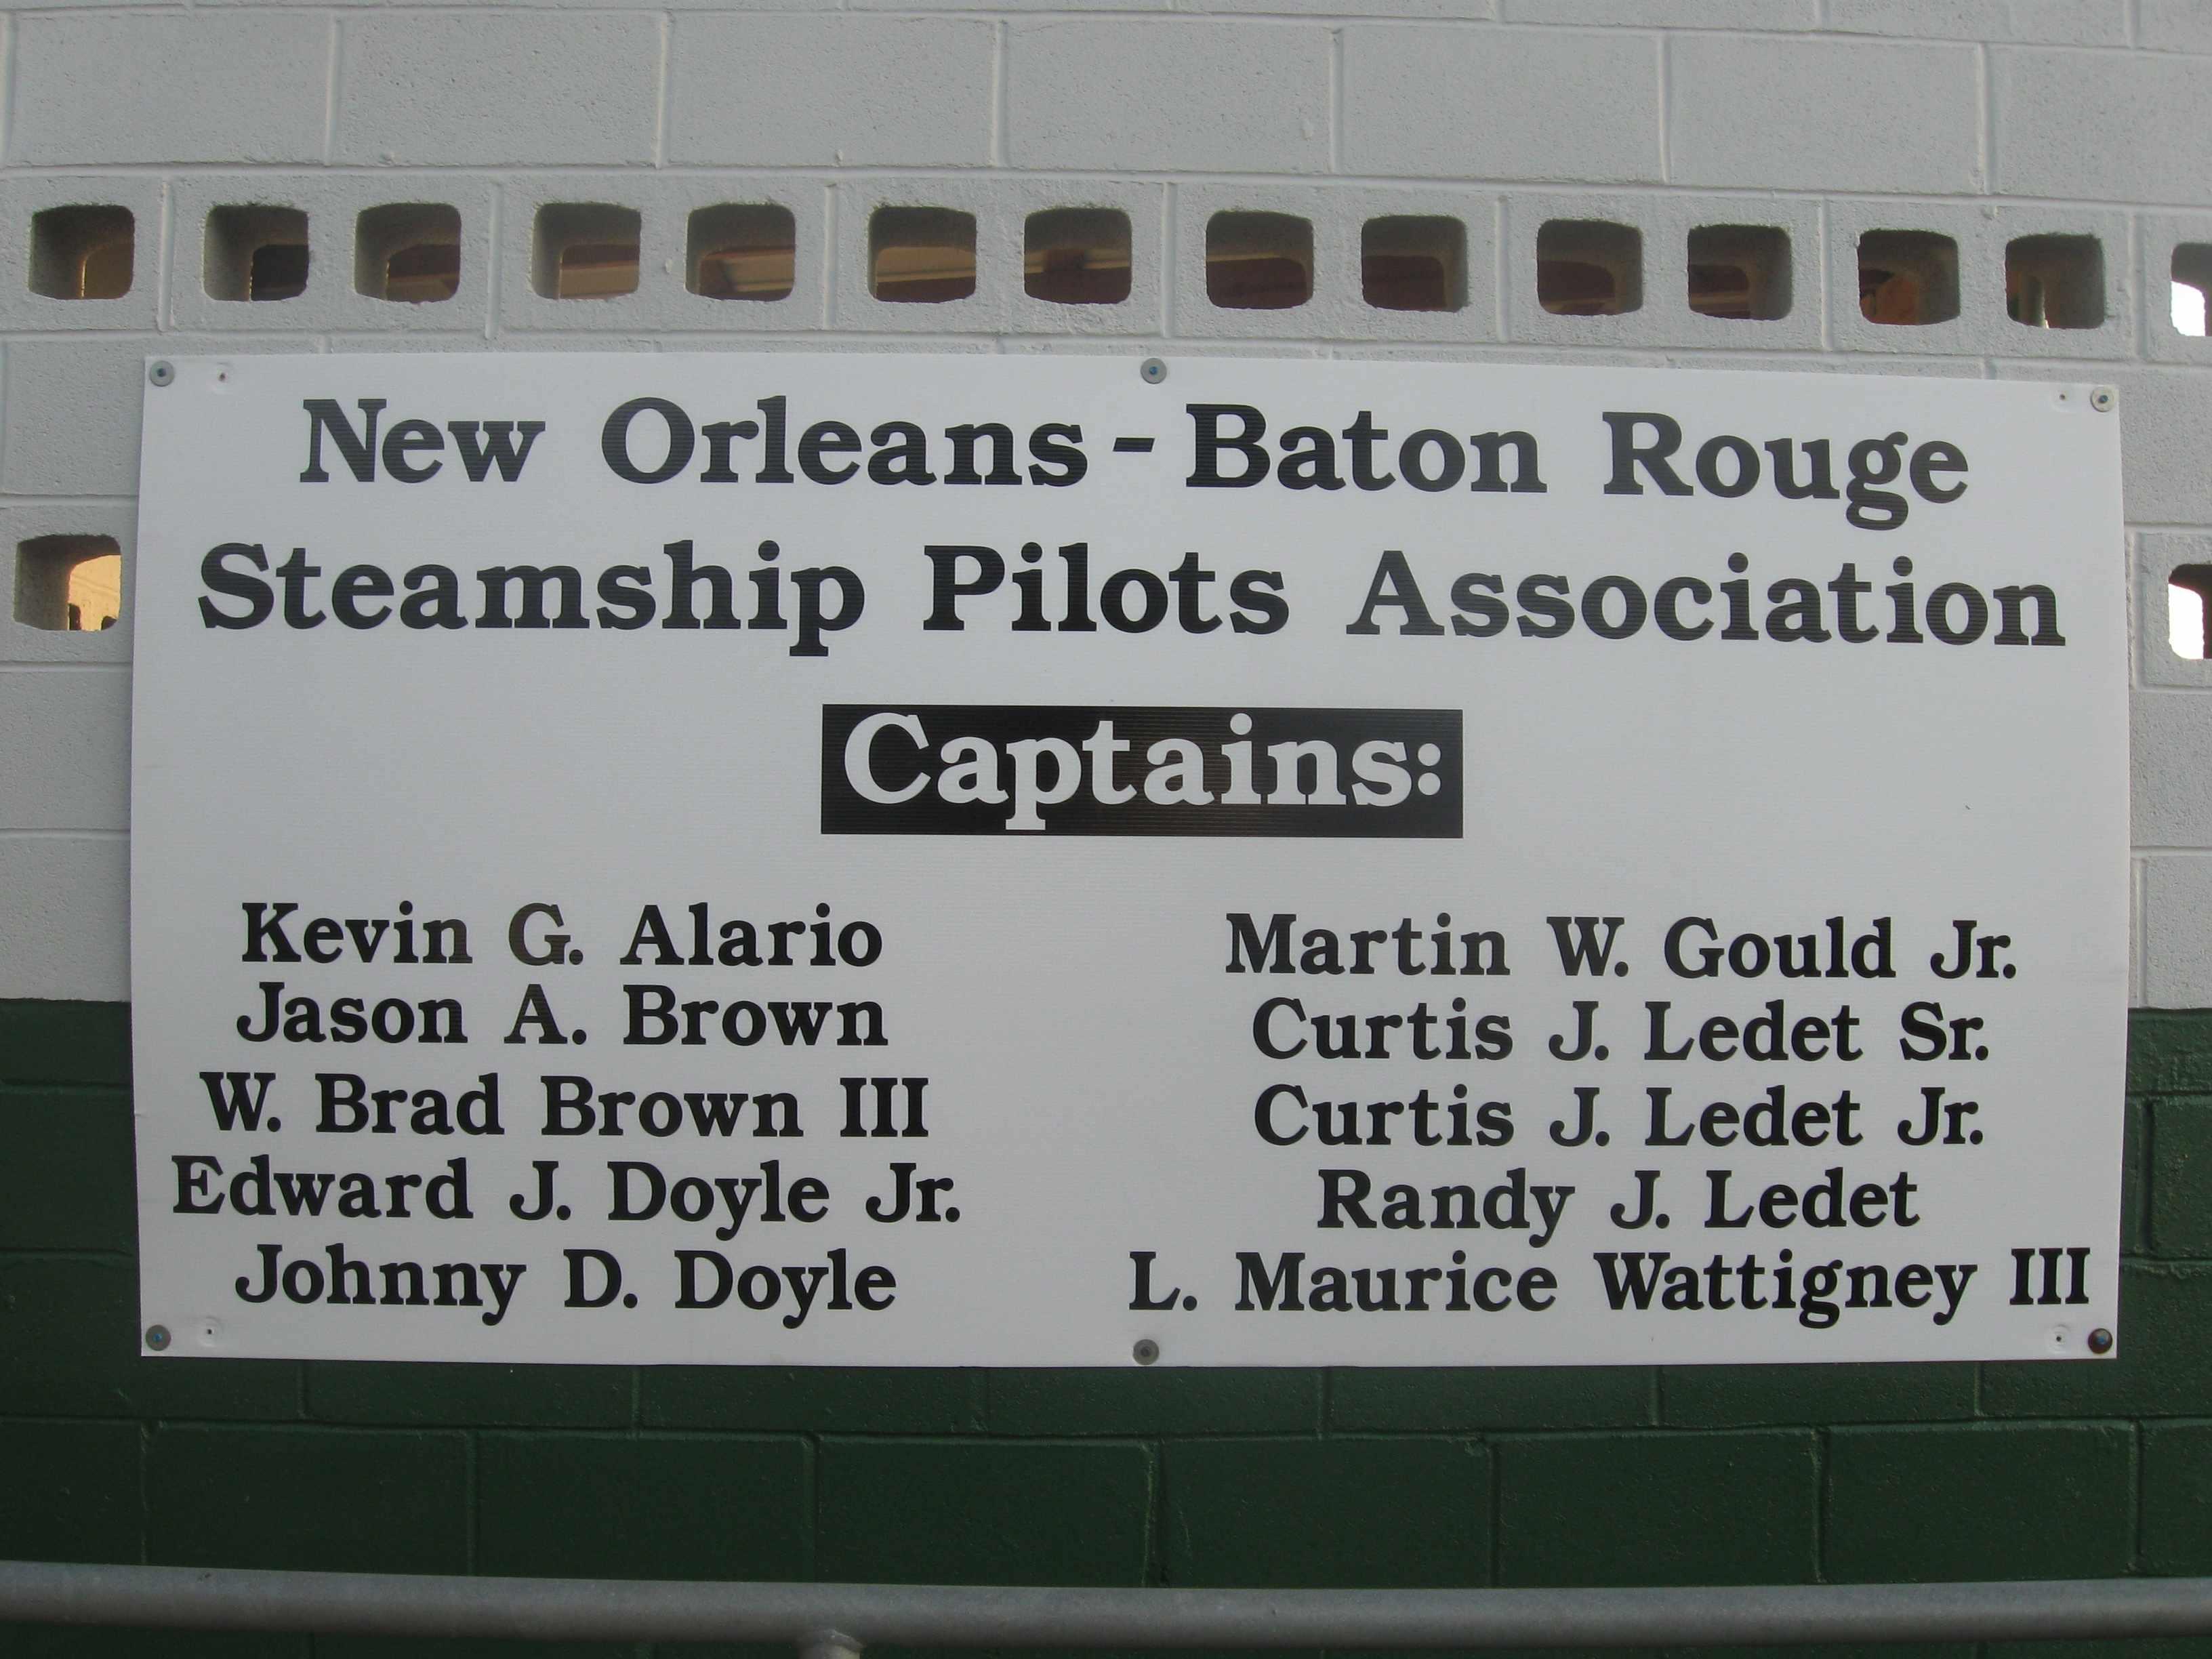 Pilots Association